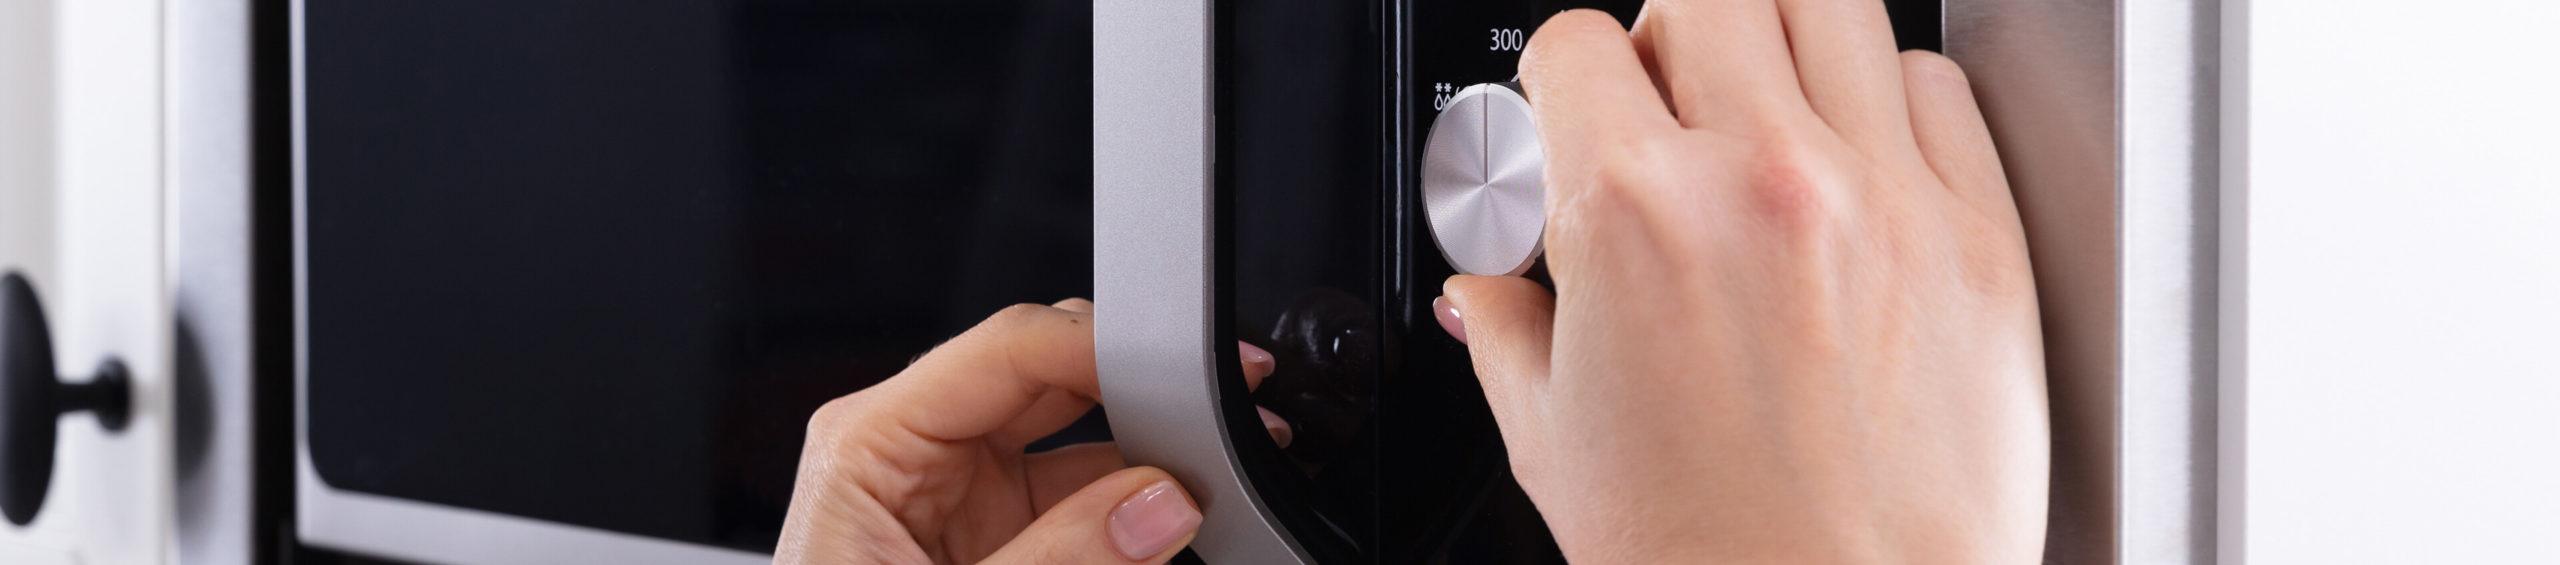 Microwave-Black-Friday